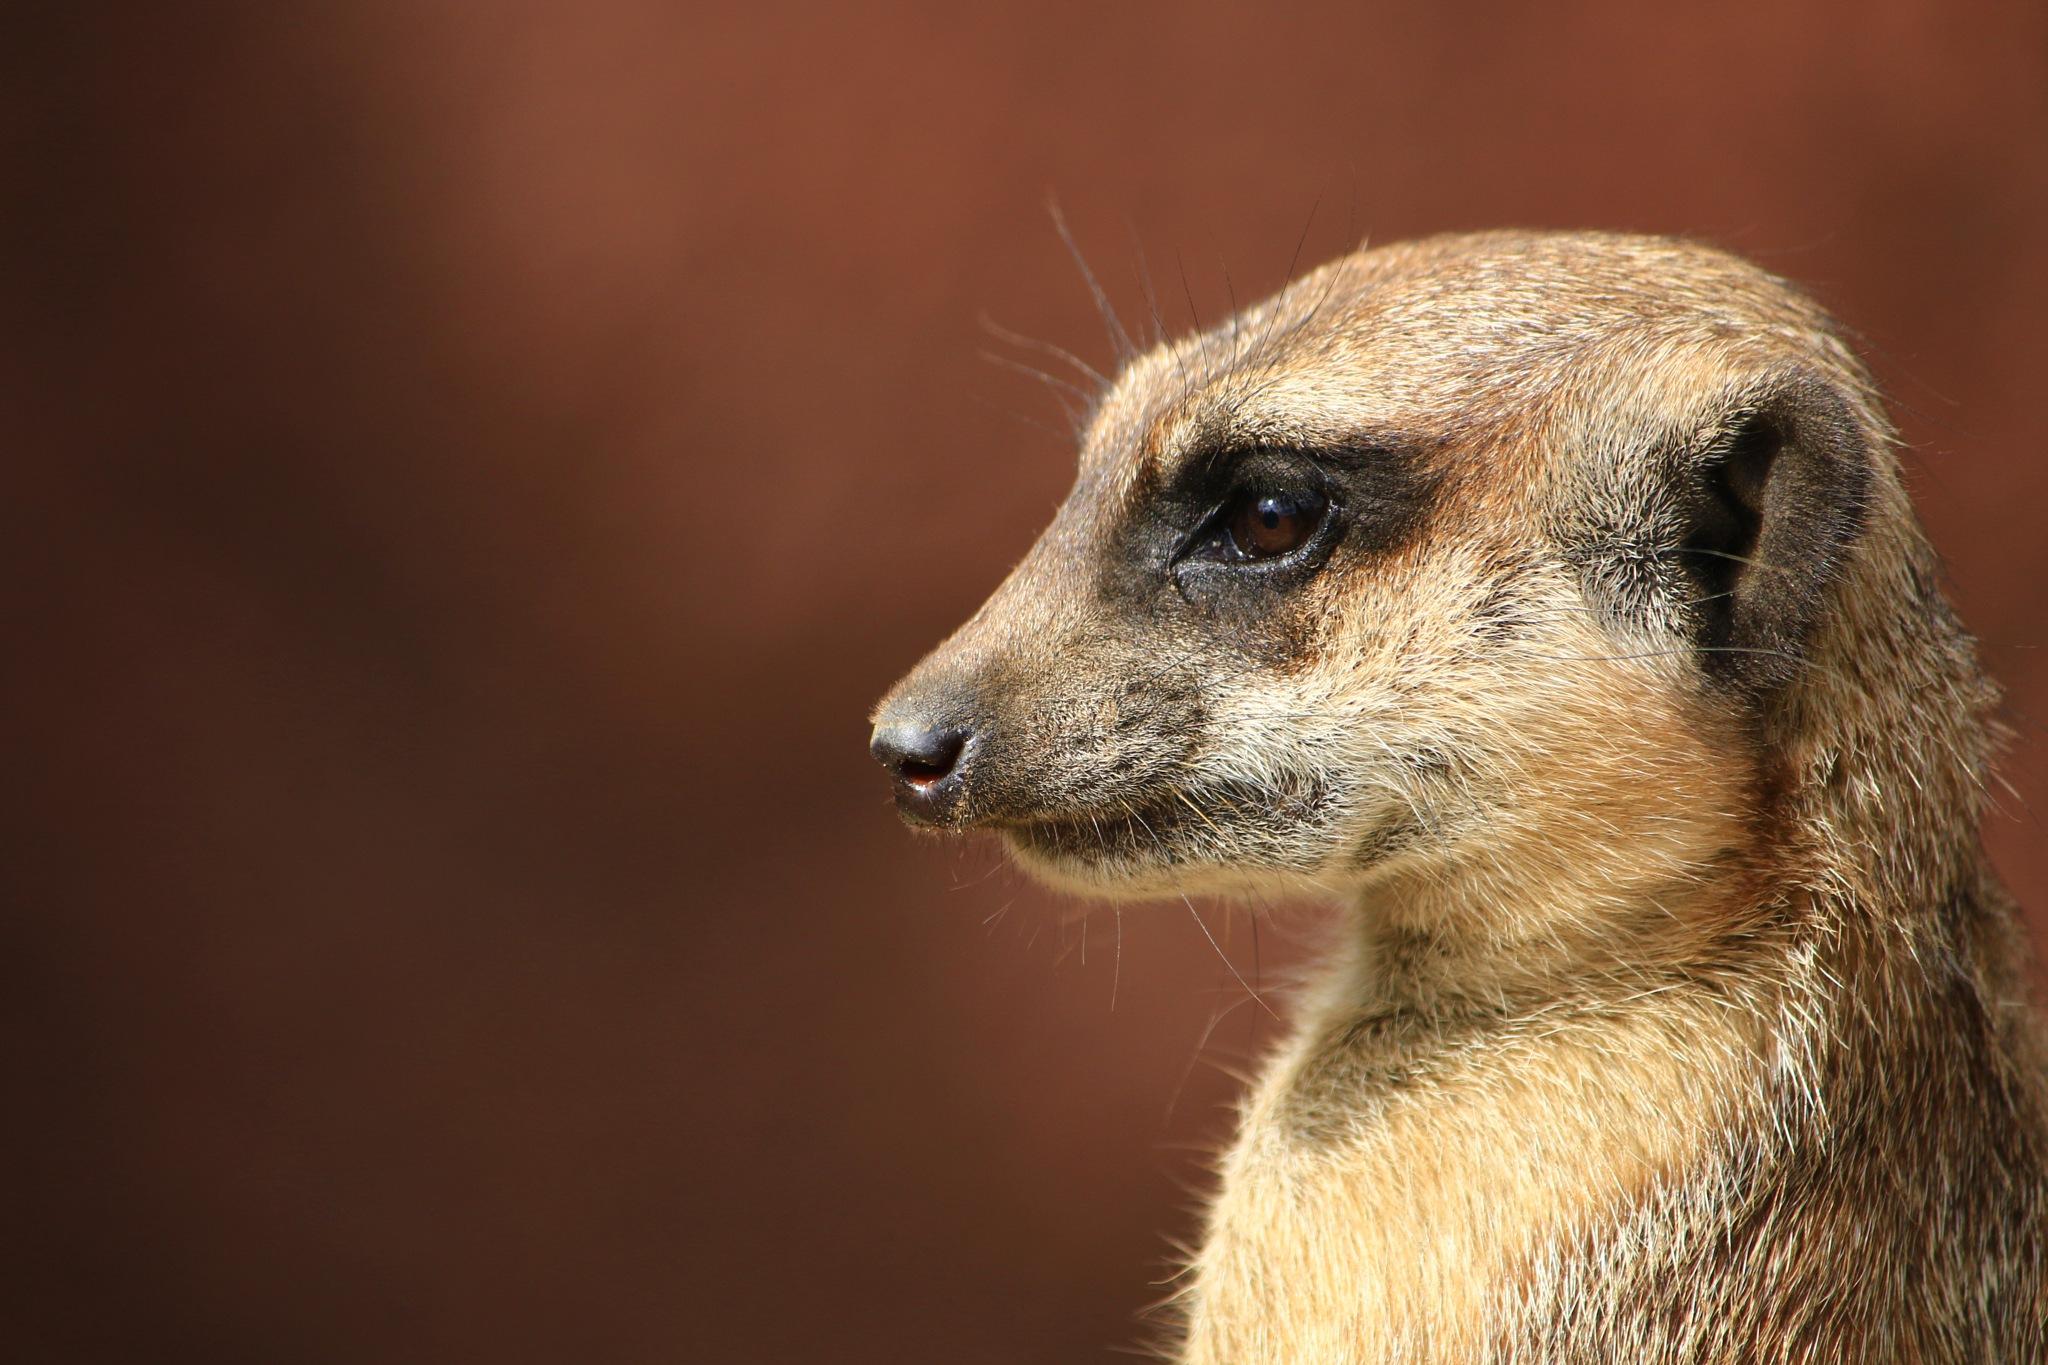 Meerkat view by Richard van oudheusden